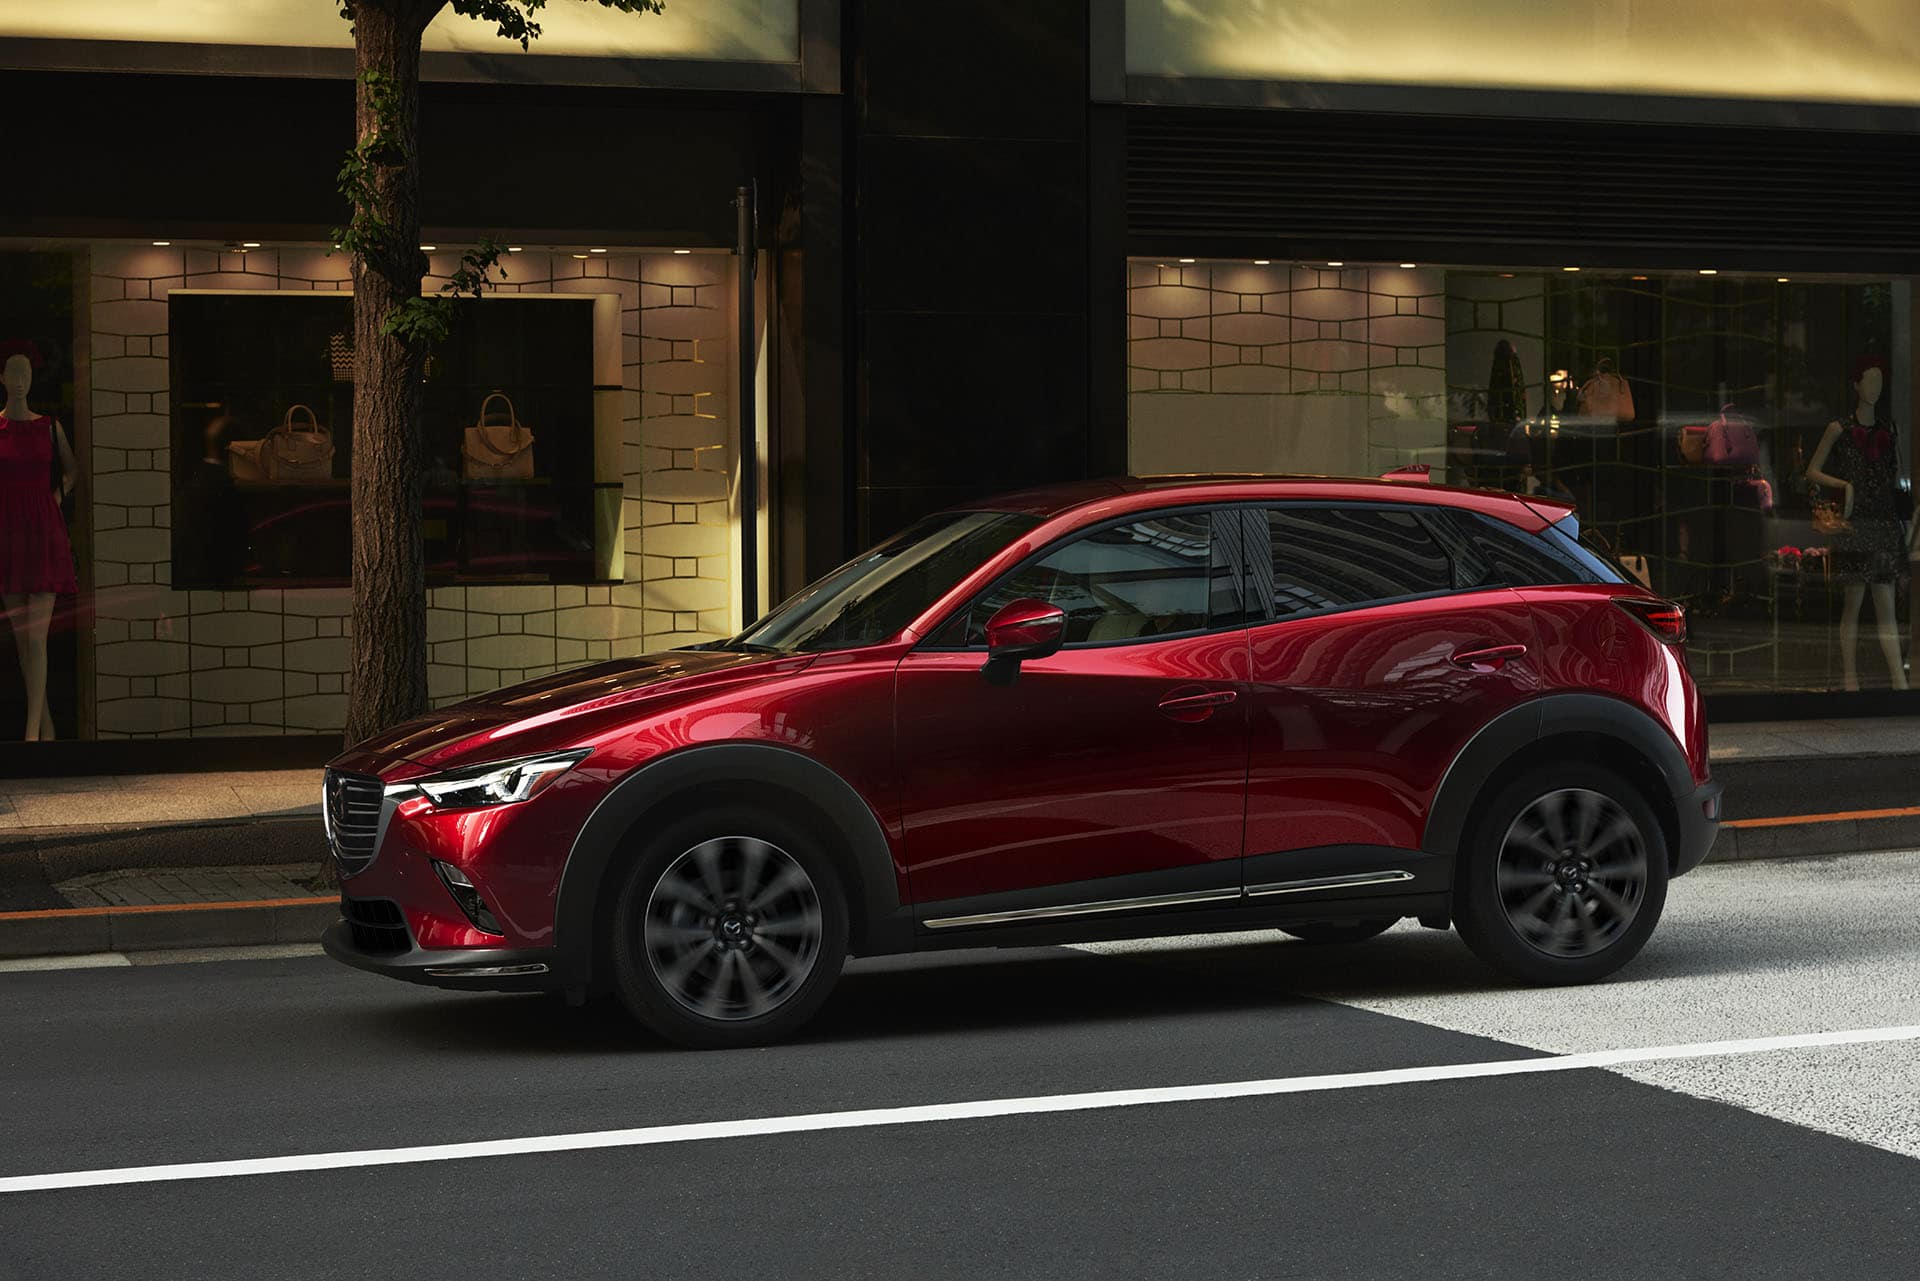 2020 Mazda CX-3 Exterior Image Drive Side